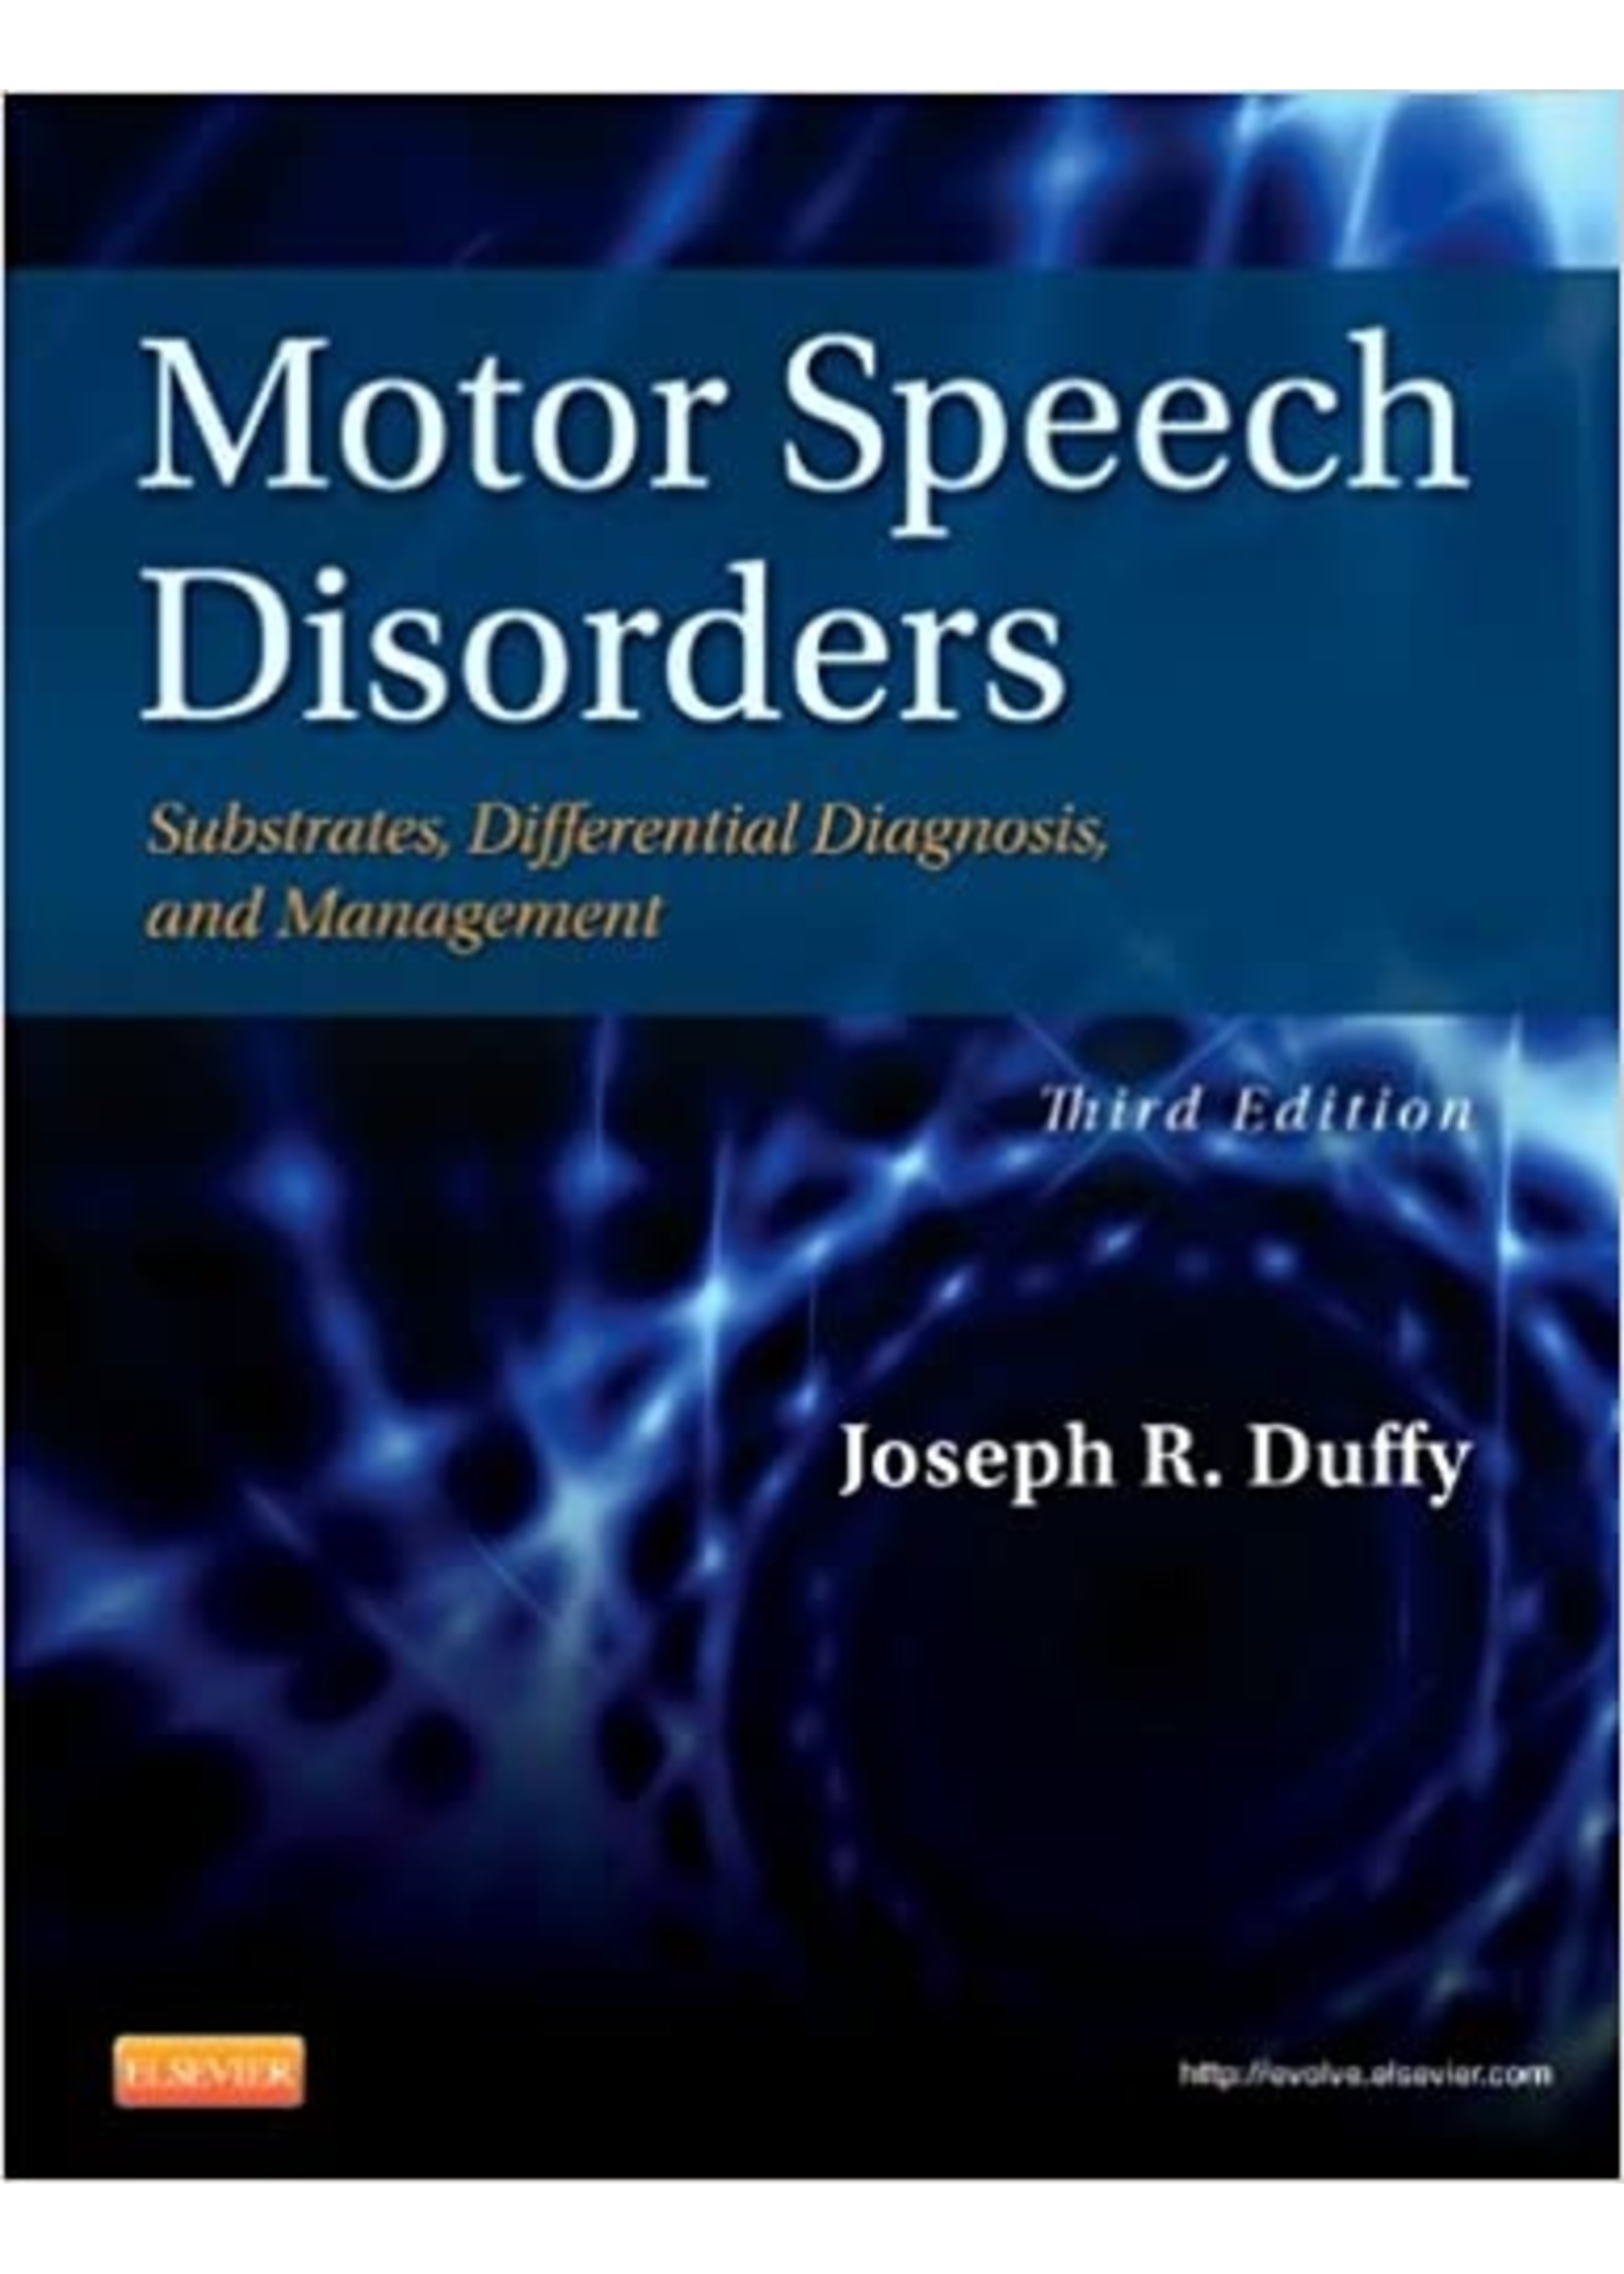 CSD534 MOTOR SPEECH DISORDERS